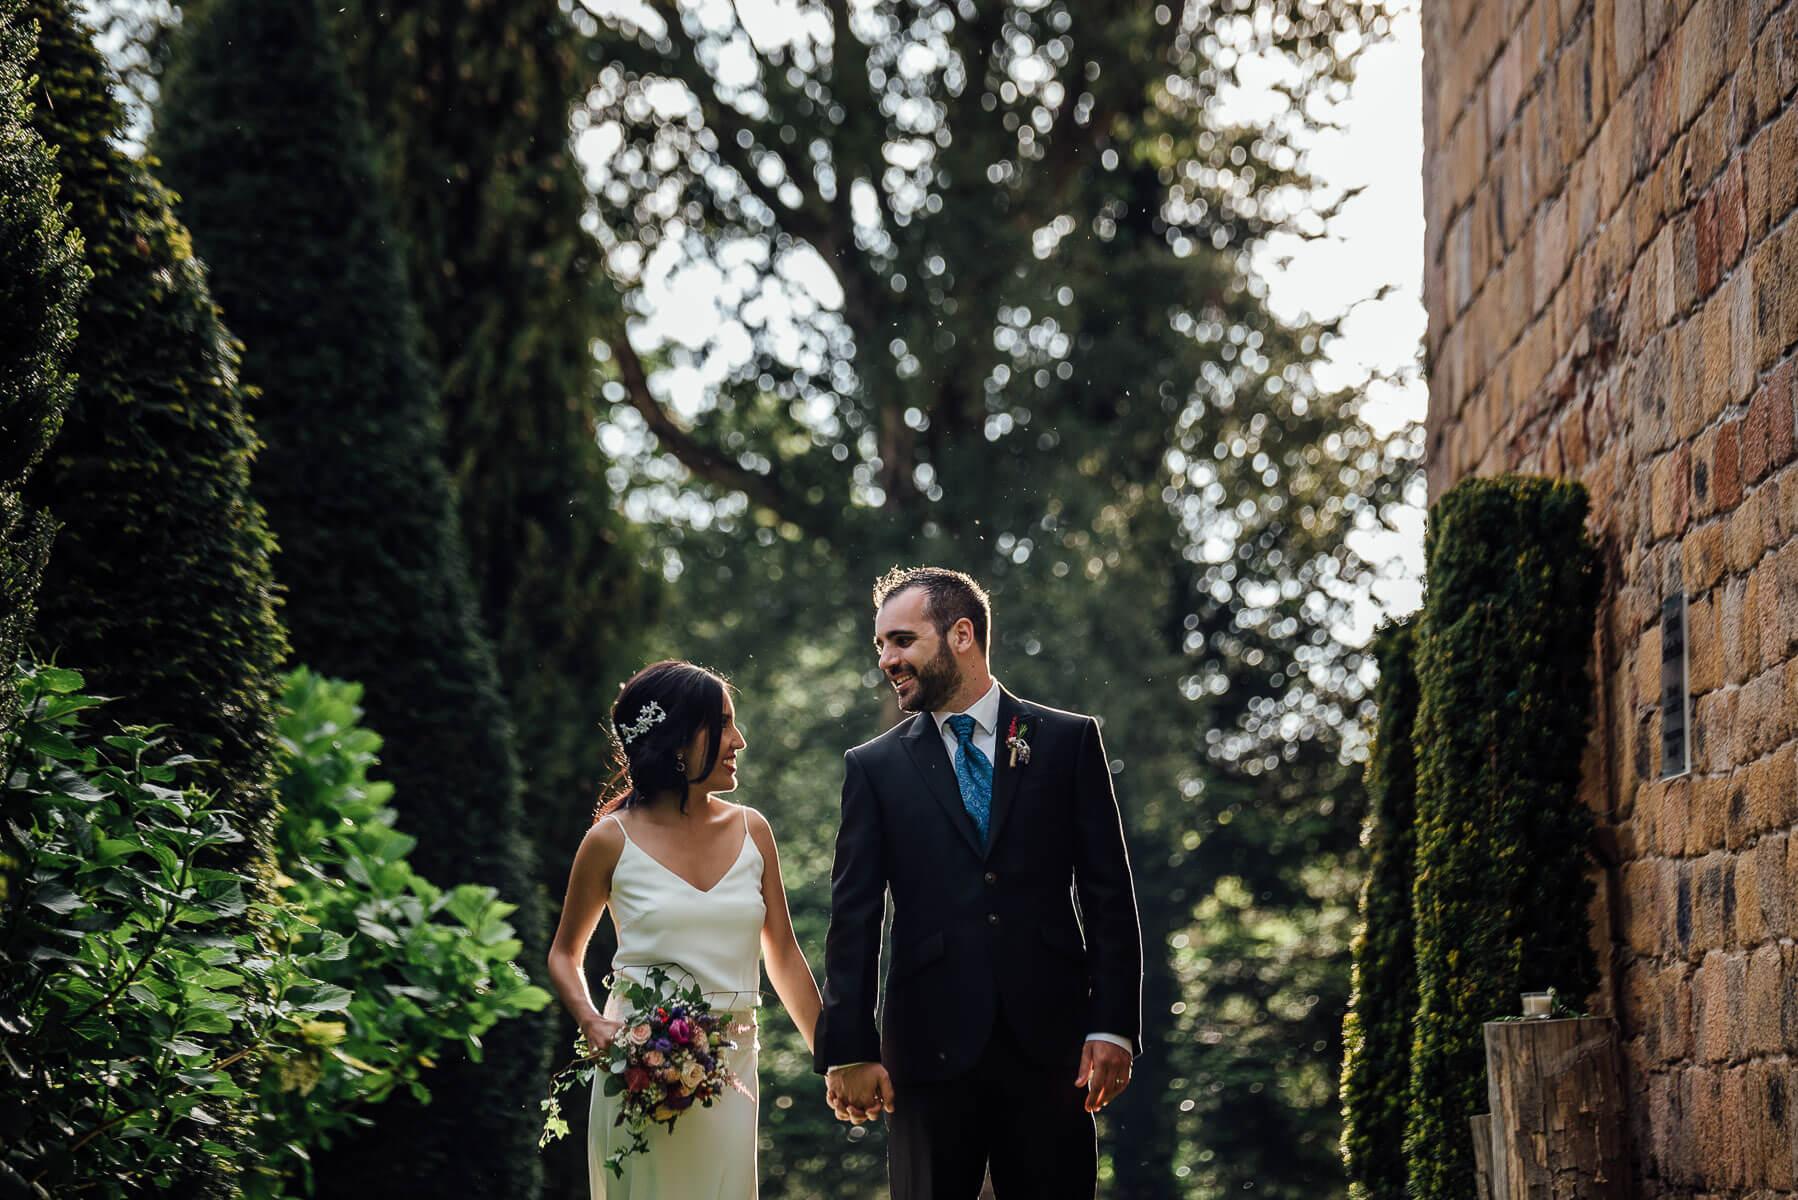 Boda Carla & Sergi novios casados - Manel Tamayo - fotografo de boda